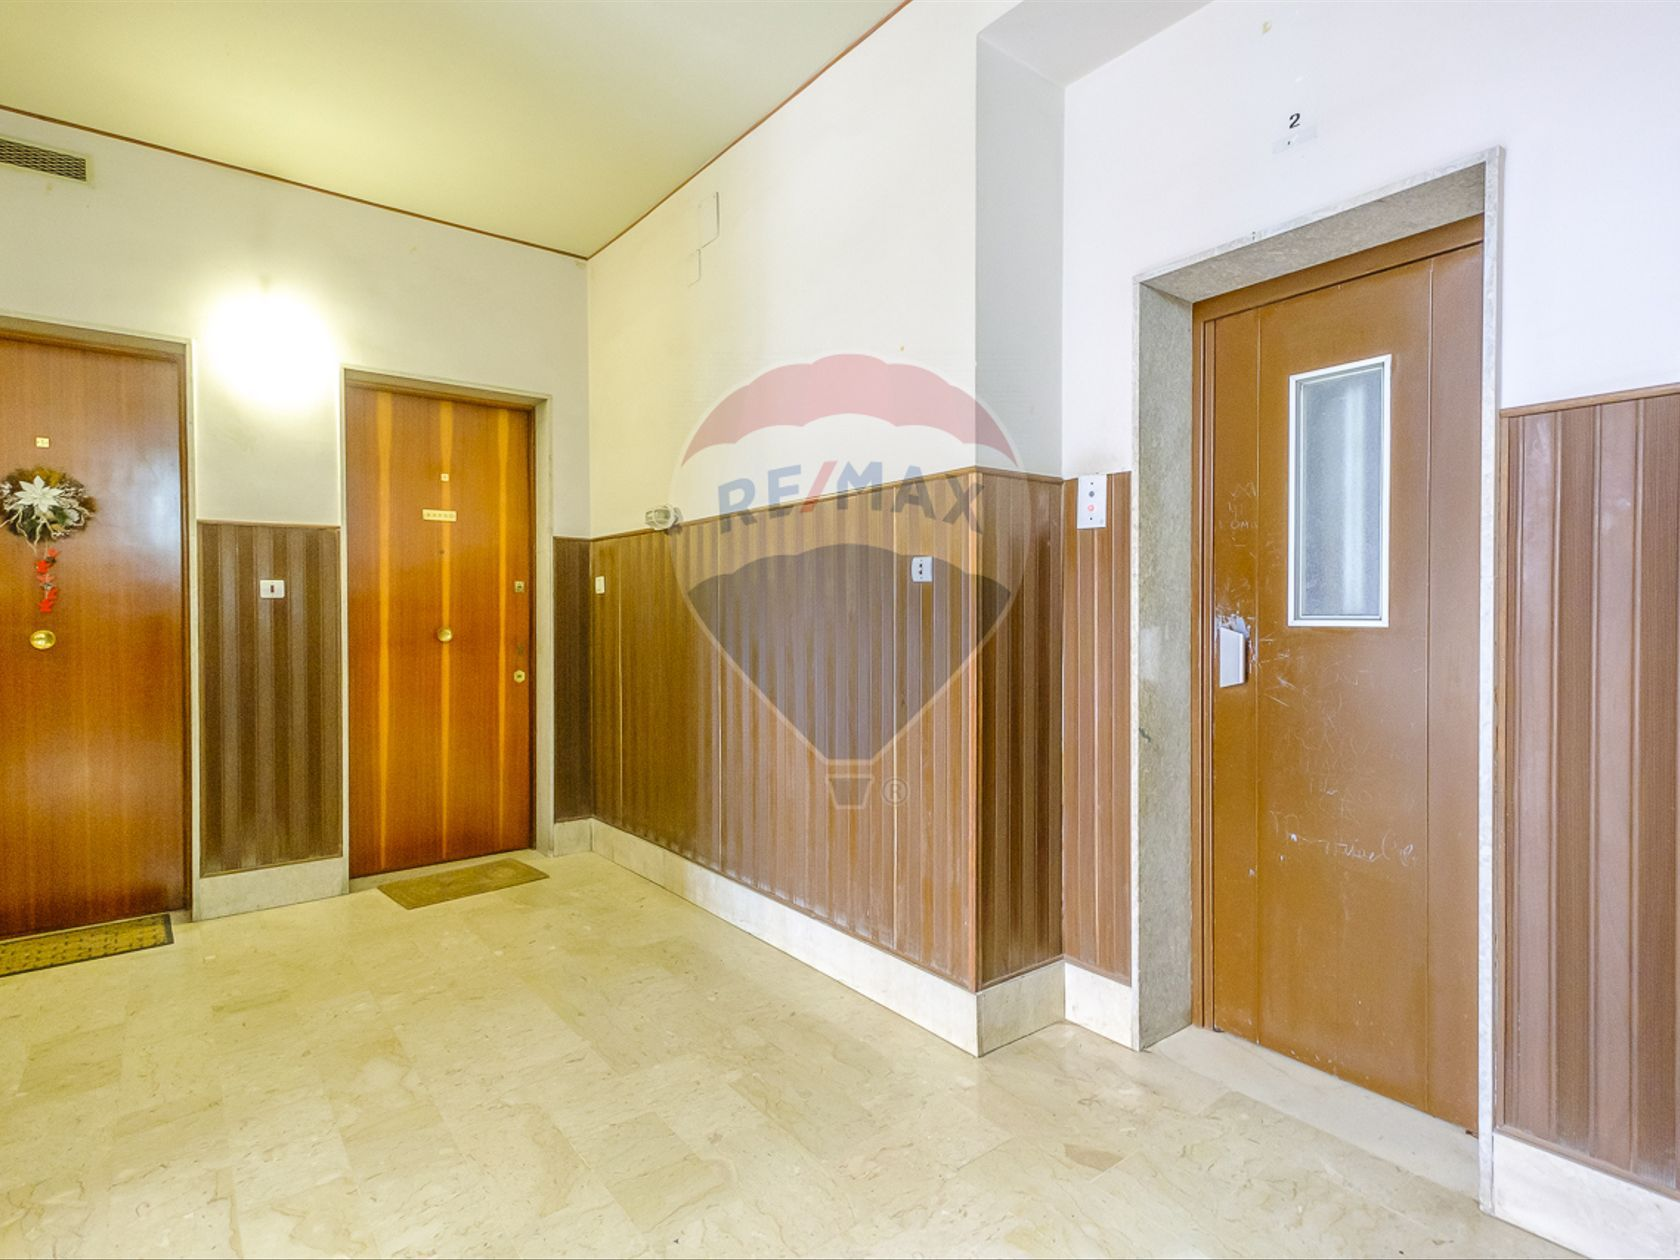 Appartamento Siracusa- Scala Greca S. Panagia Teracati Zecchino, Siracusa, SR Vendita - Foto 24